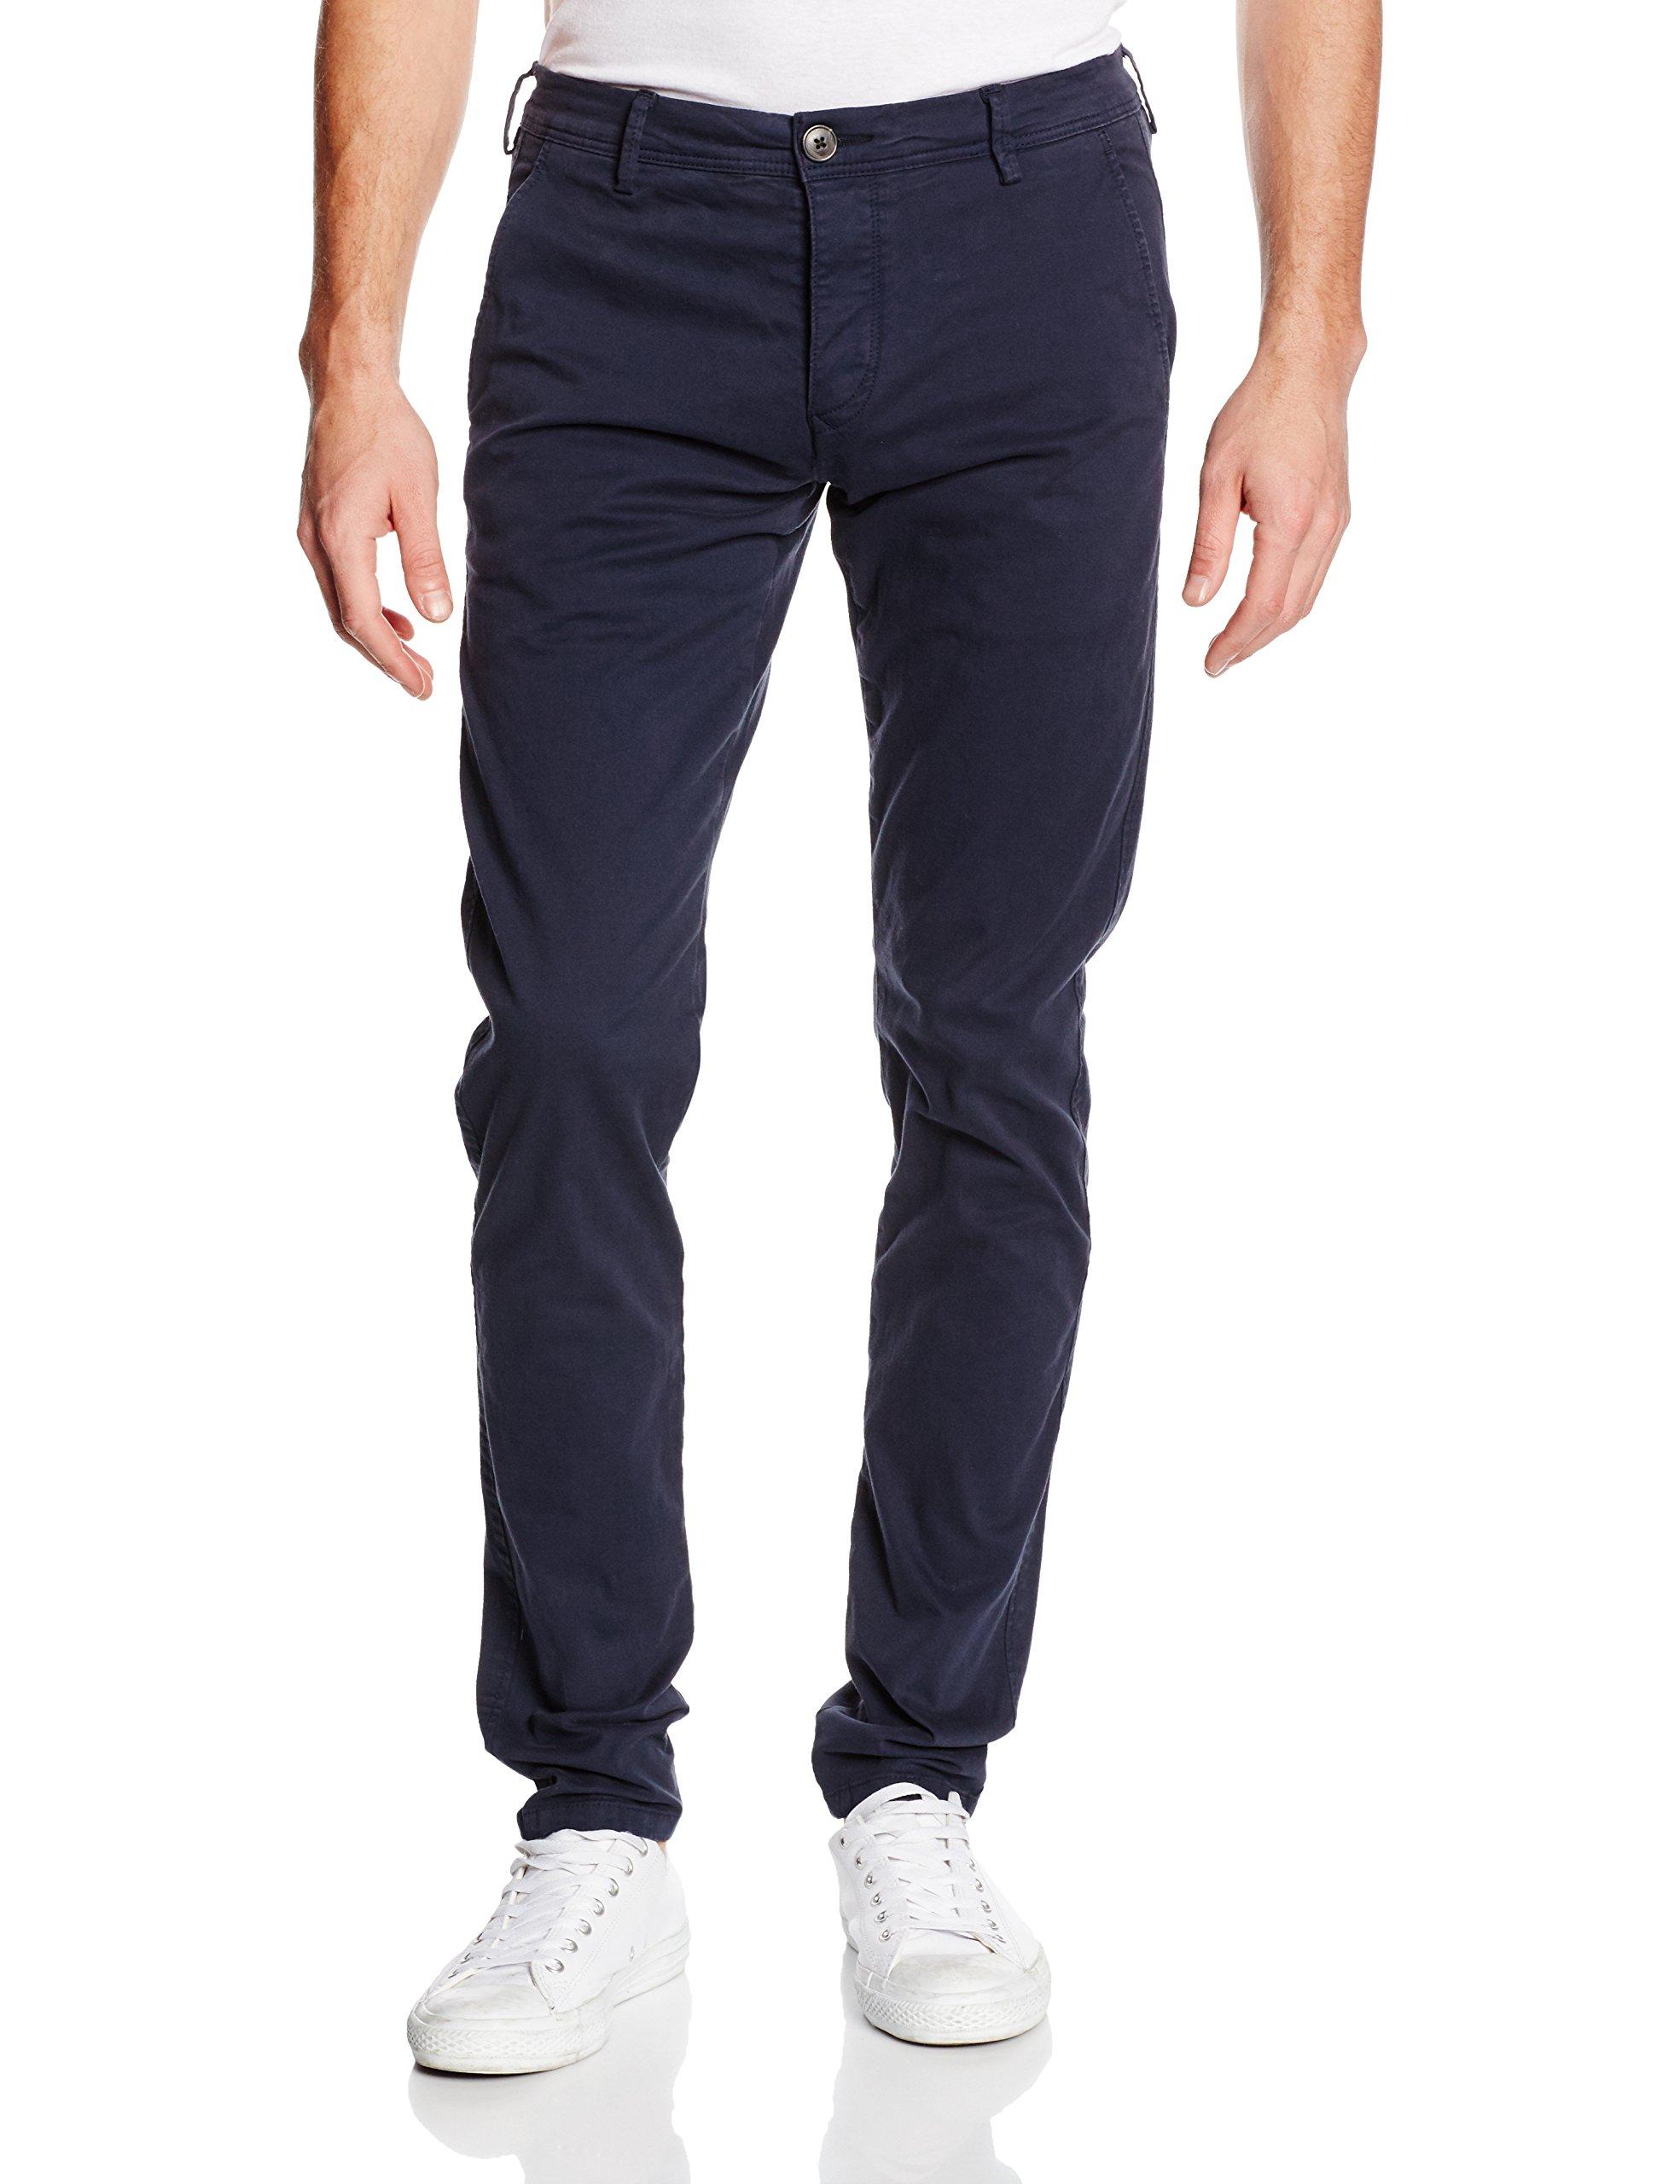 Selected Homme Men's SHOne Luca Pants Navy Blazer Size W31/L32 98% cotton and 2% elastane.